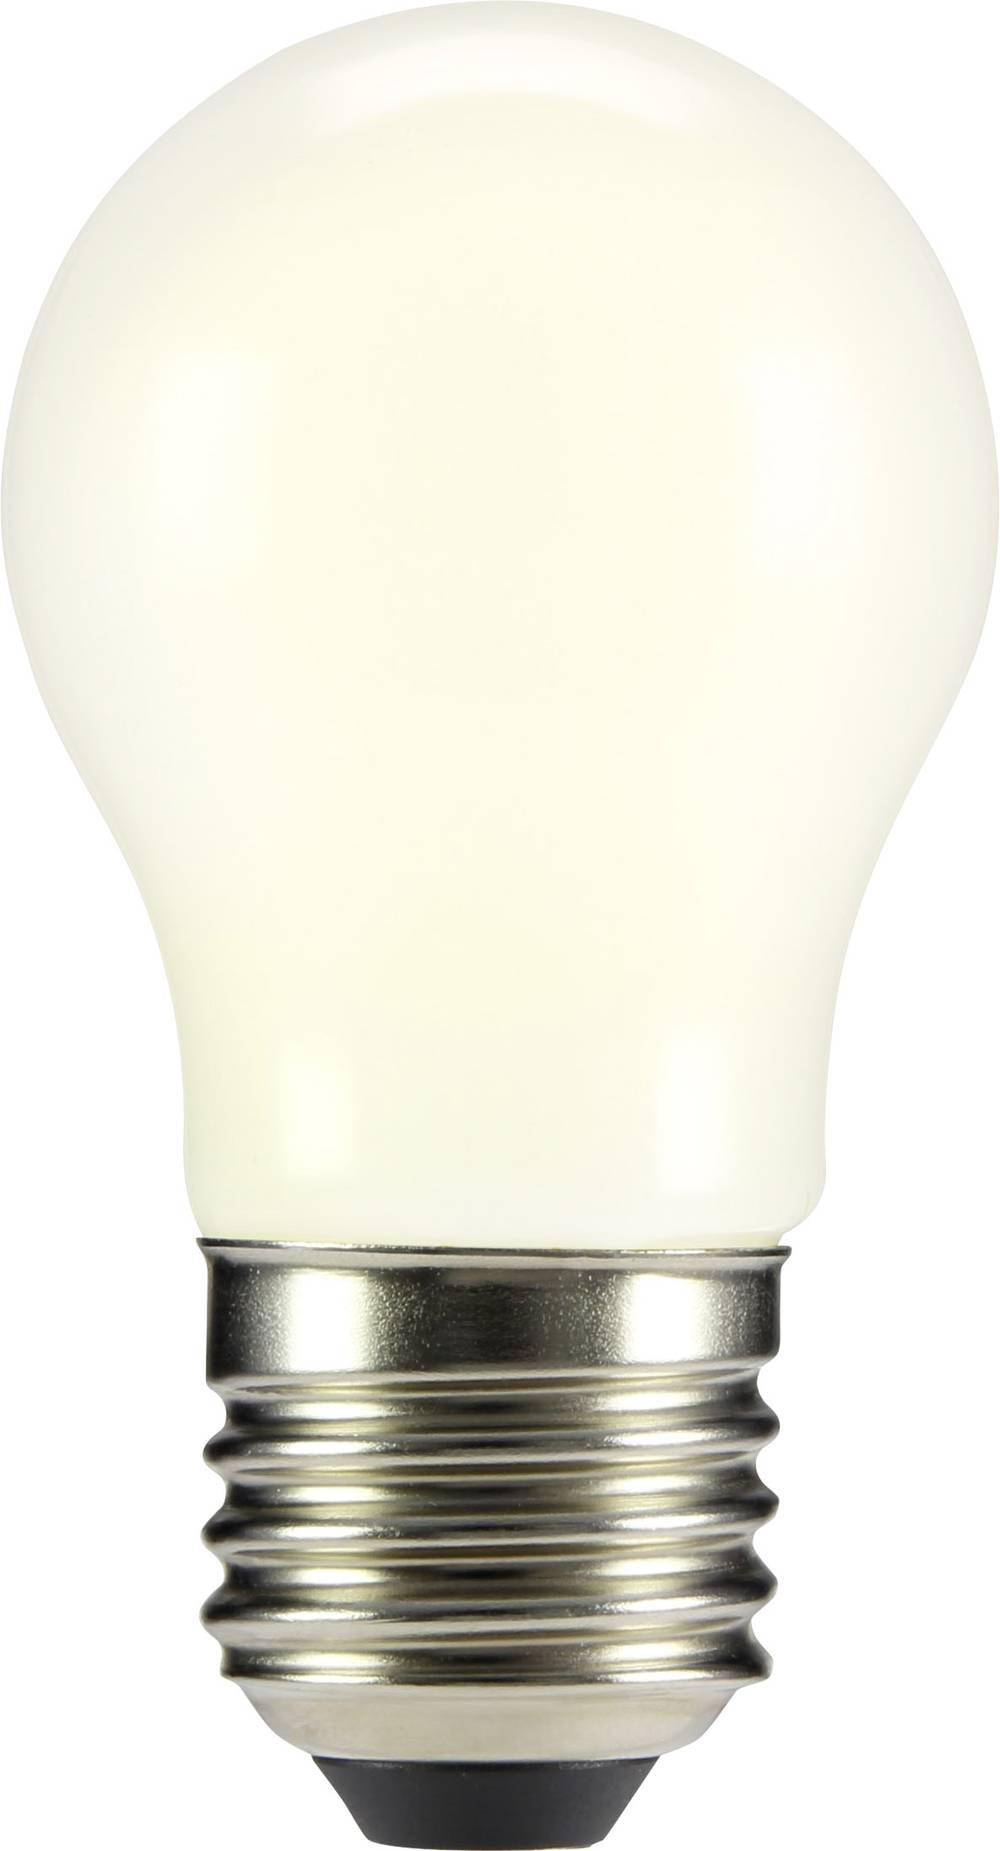 LED žarnica E27 oblika kaplje 2 W = 23 W topla bela (premer x D) 45 mm x 84 mm EEK: A++ Sygonix filament 1 kos